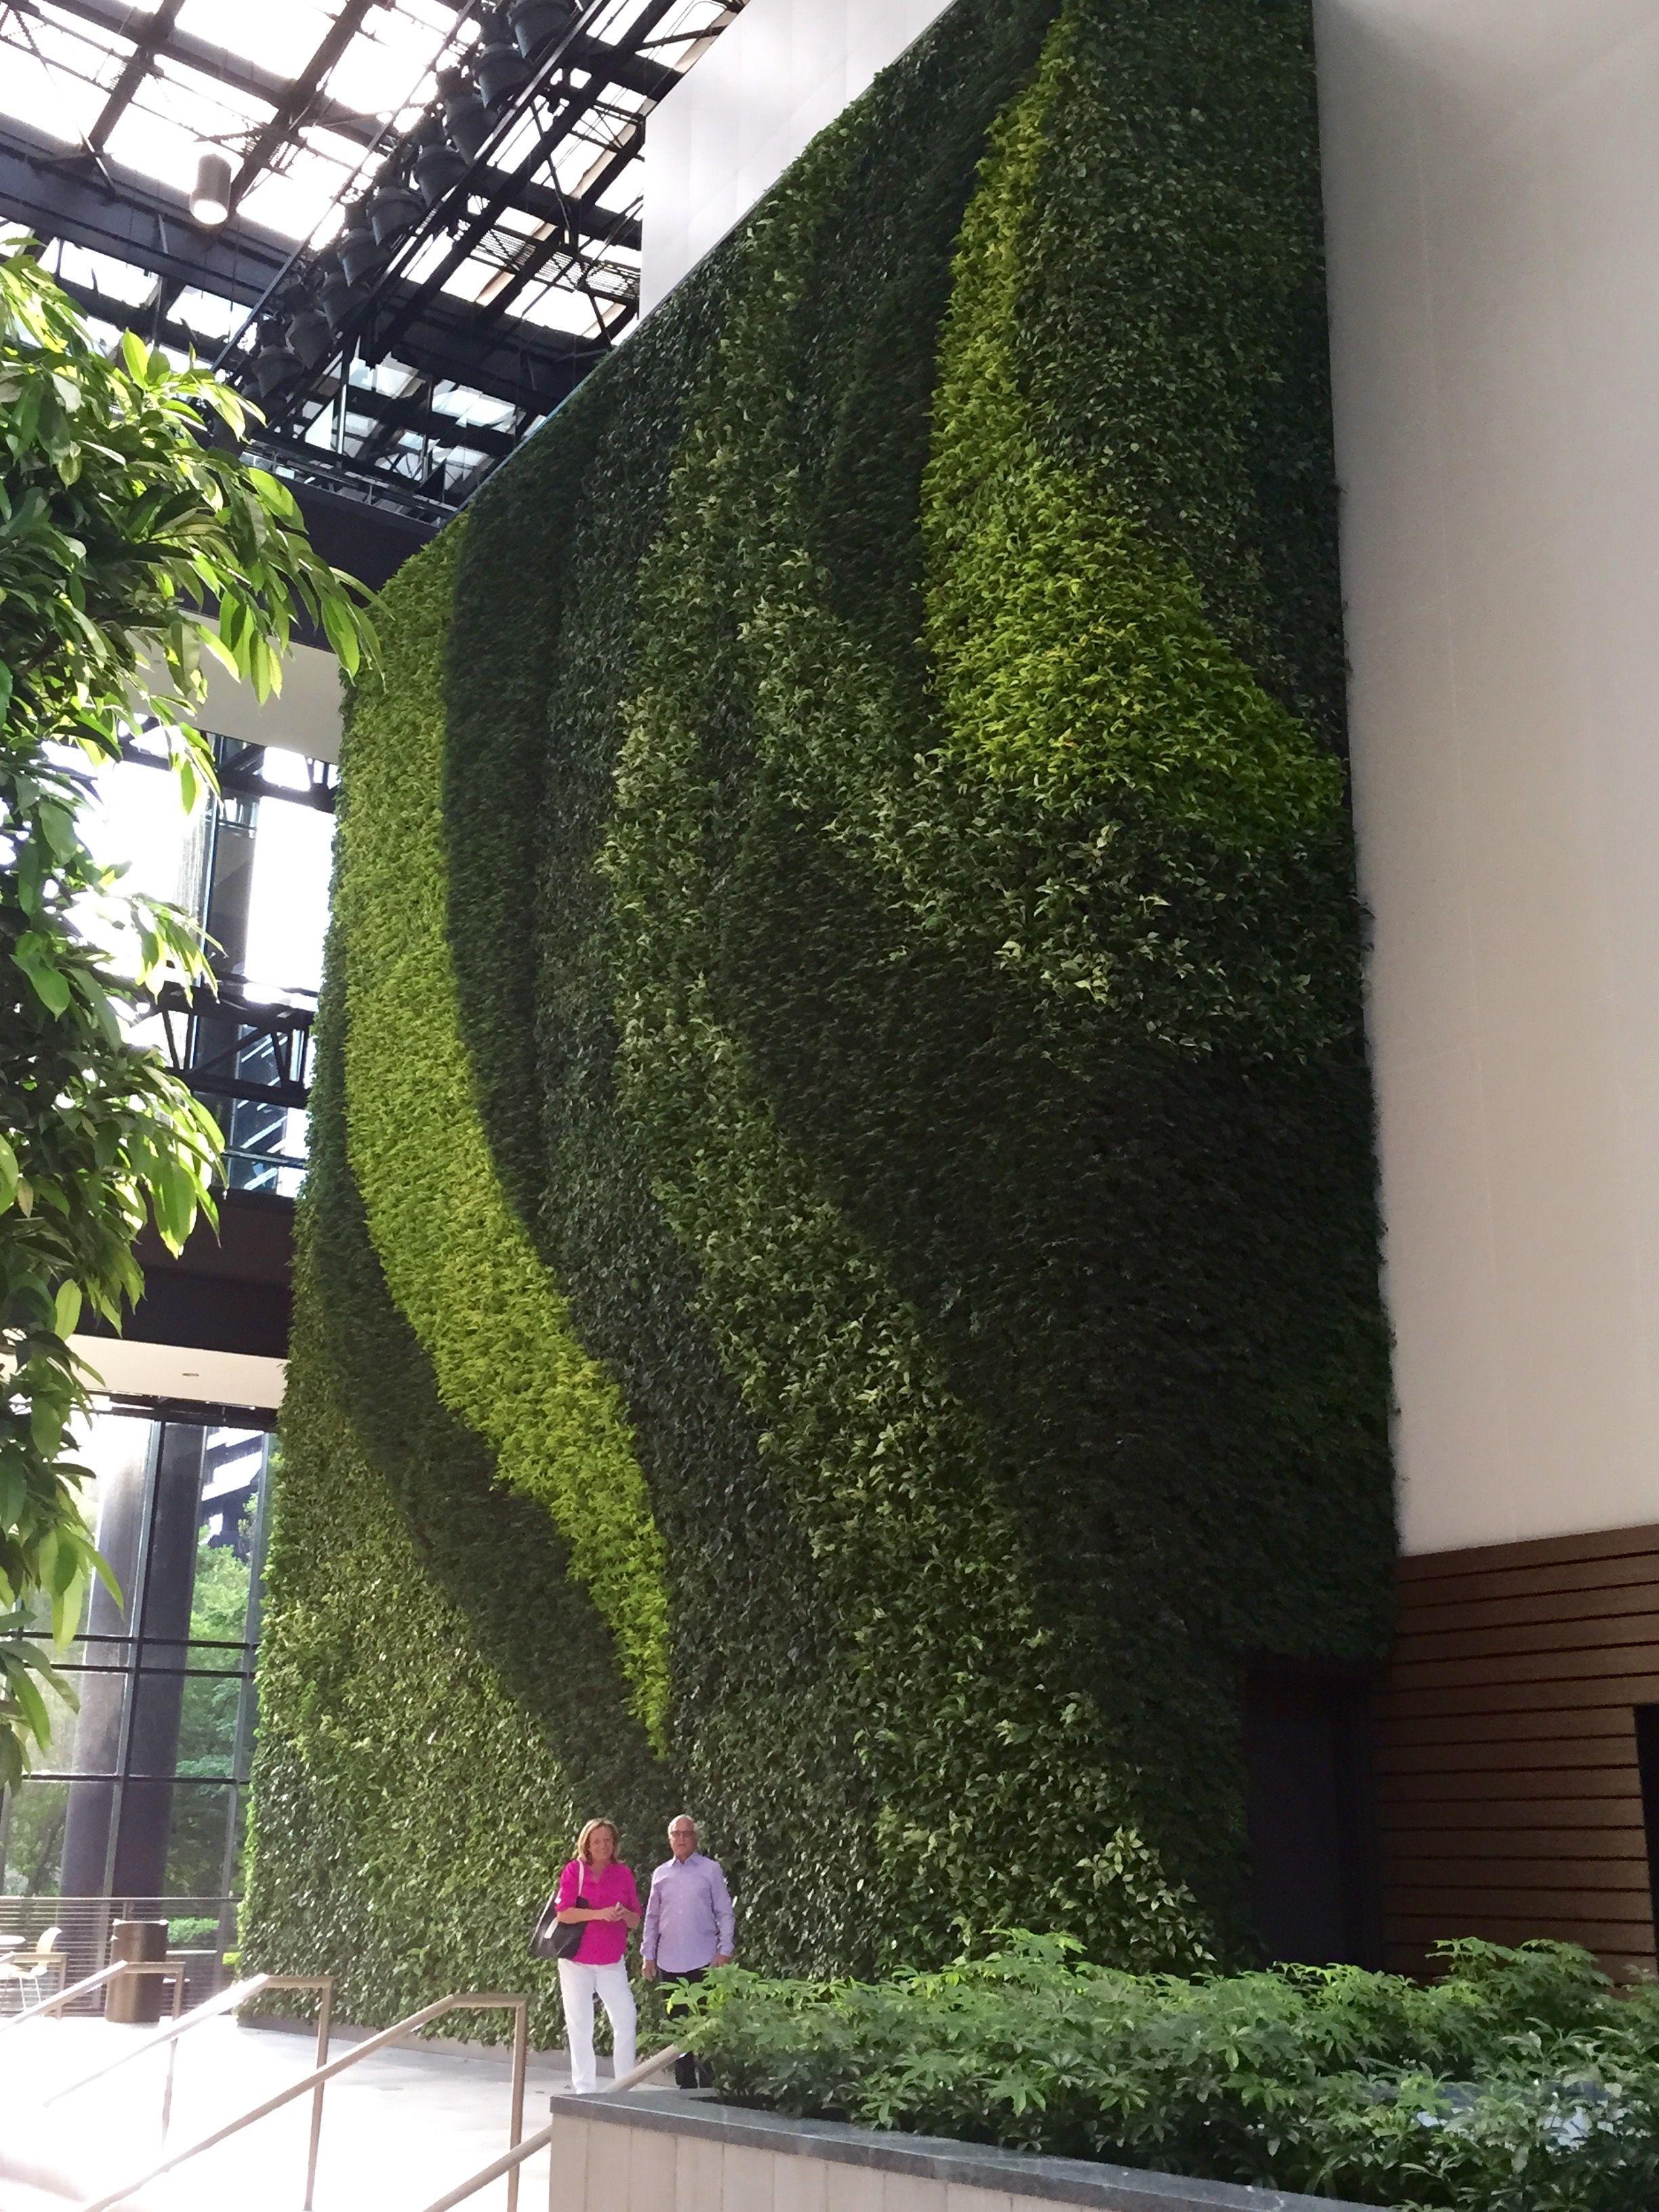 Gsky Living Green Walls: Pin By Debbie Kotalic On Vertical Living Green Walls GSky